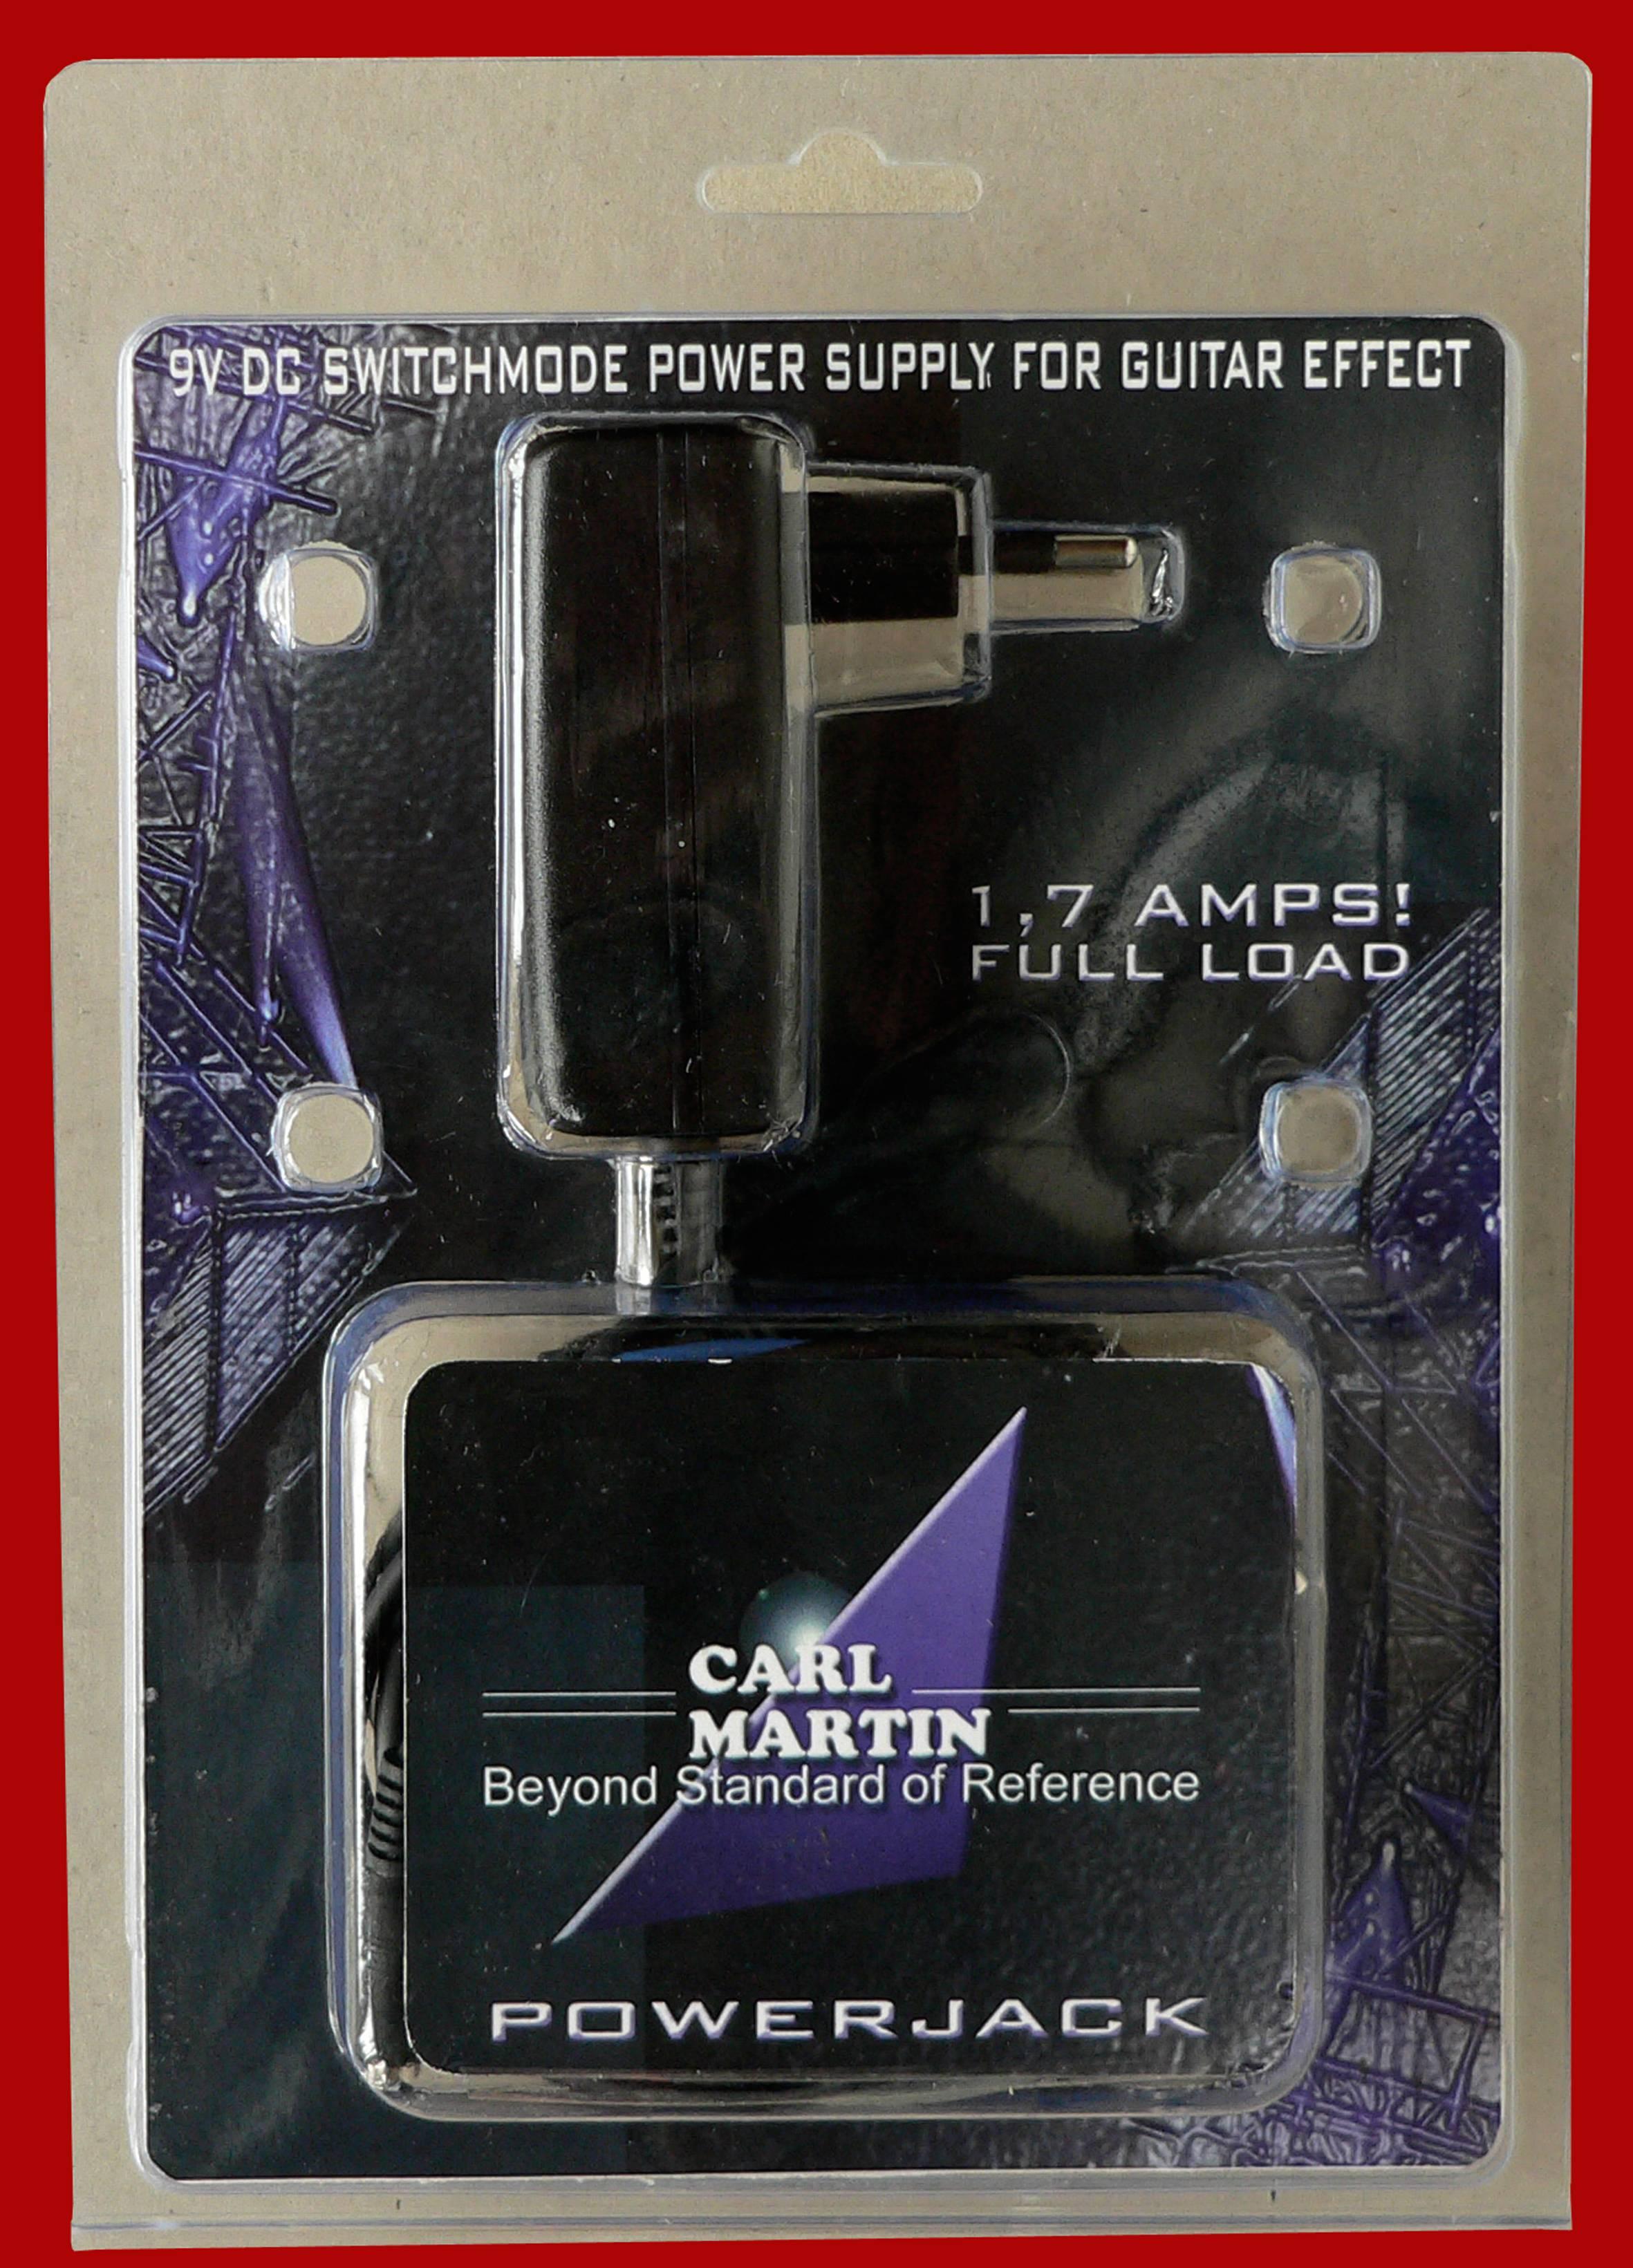 carl martin powerjack 2010 39 s effect pedal for sale carl martin. Black Bedroom Furniture Sets. Home Design Ideas